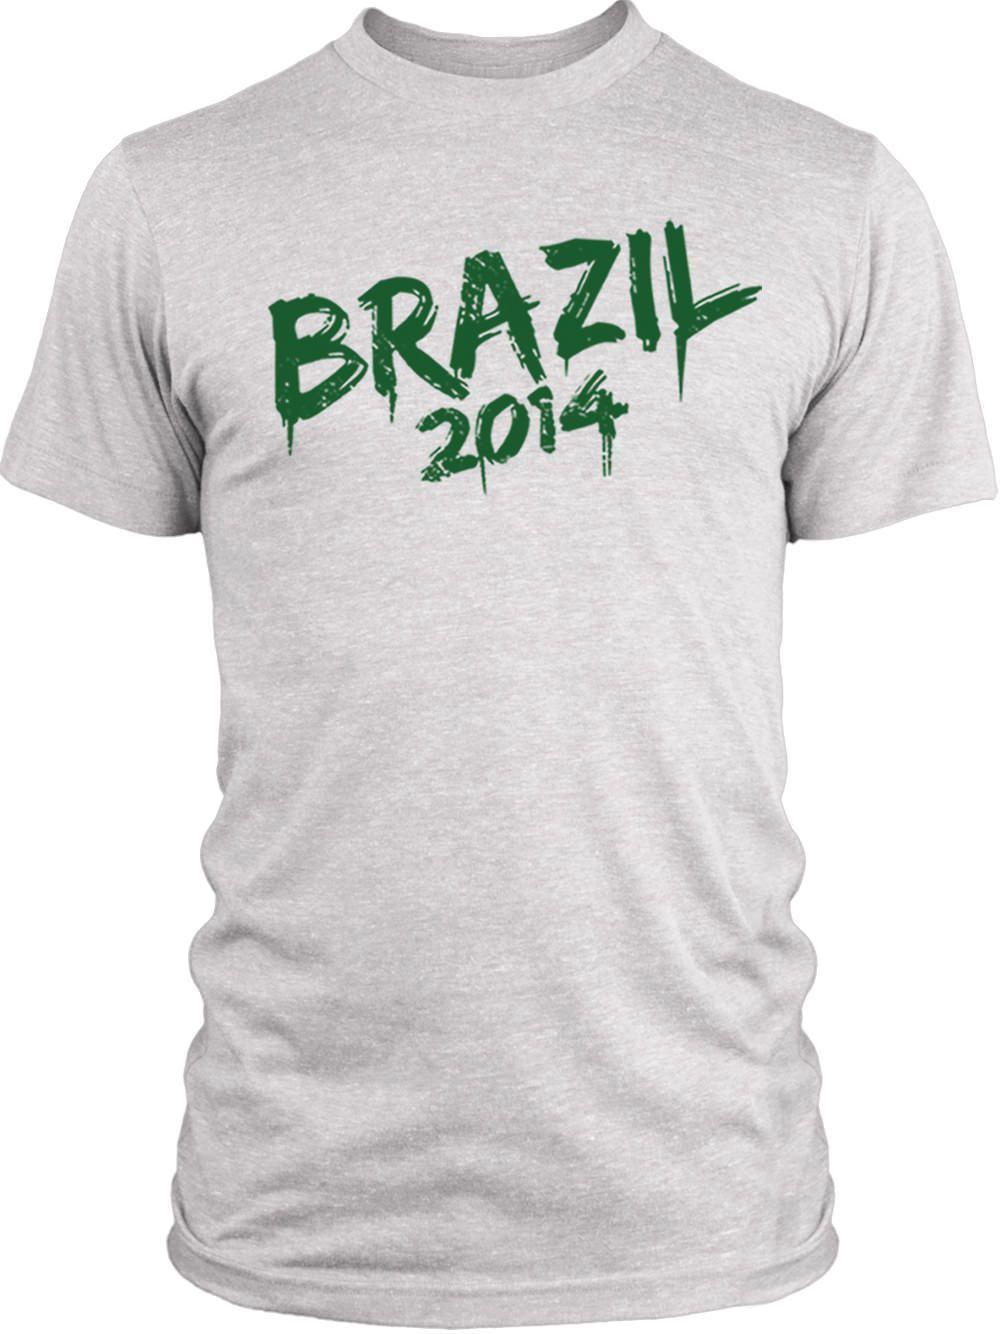 Big Texas Brazil 2014 (Green) Vintage Tri-Blend T-Shirt